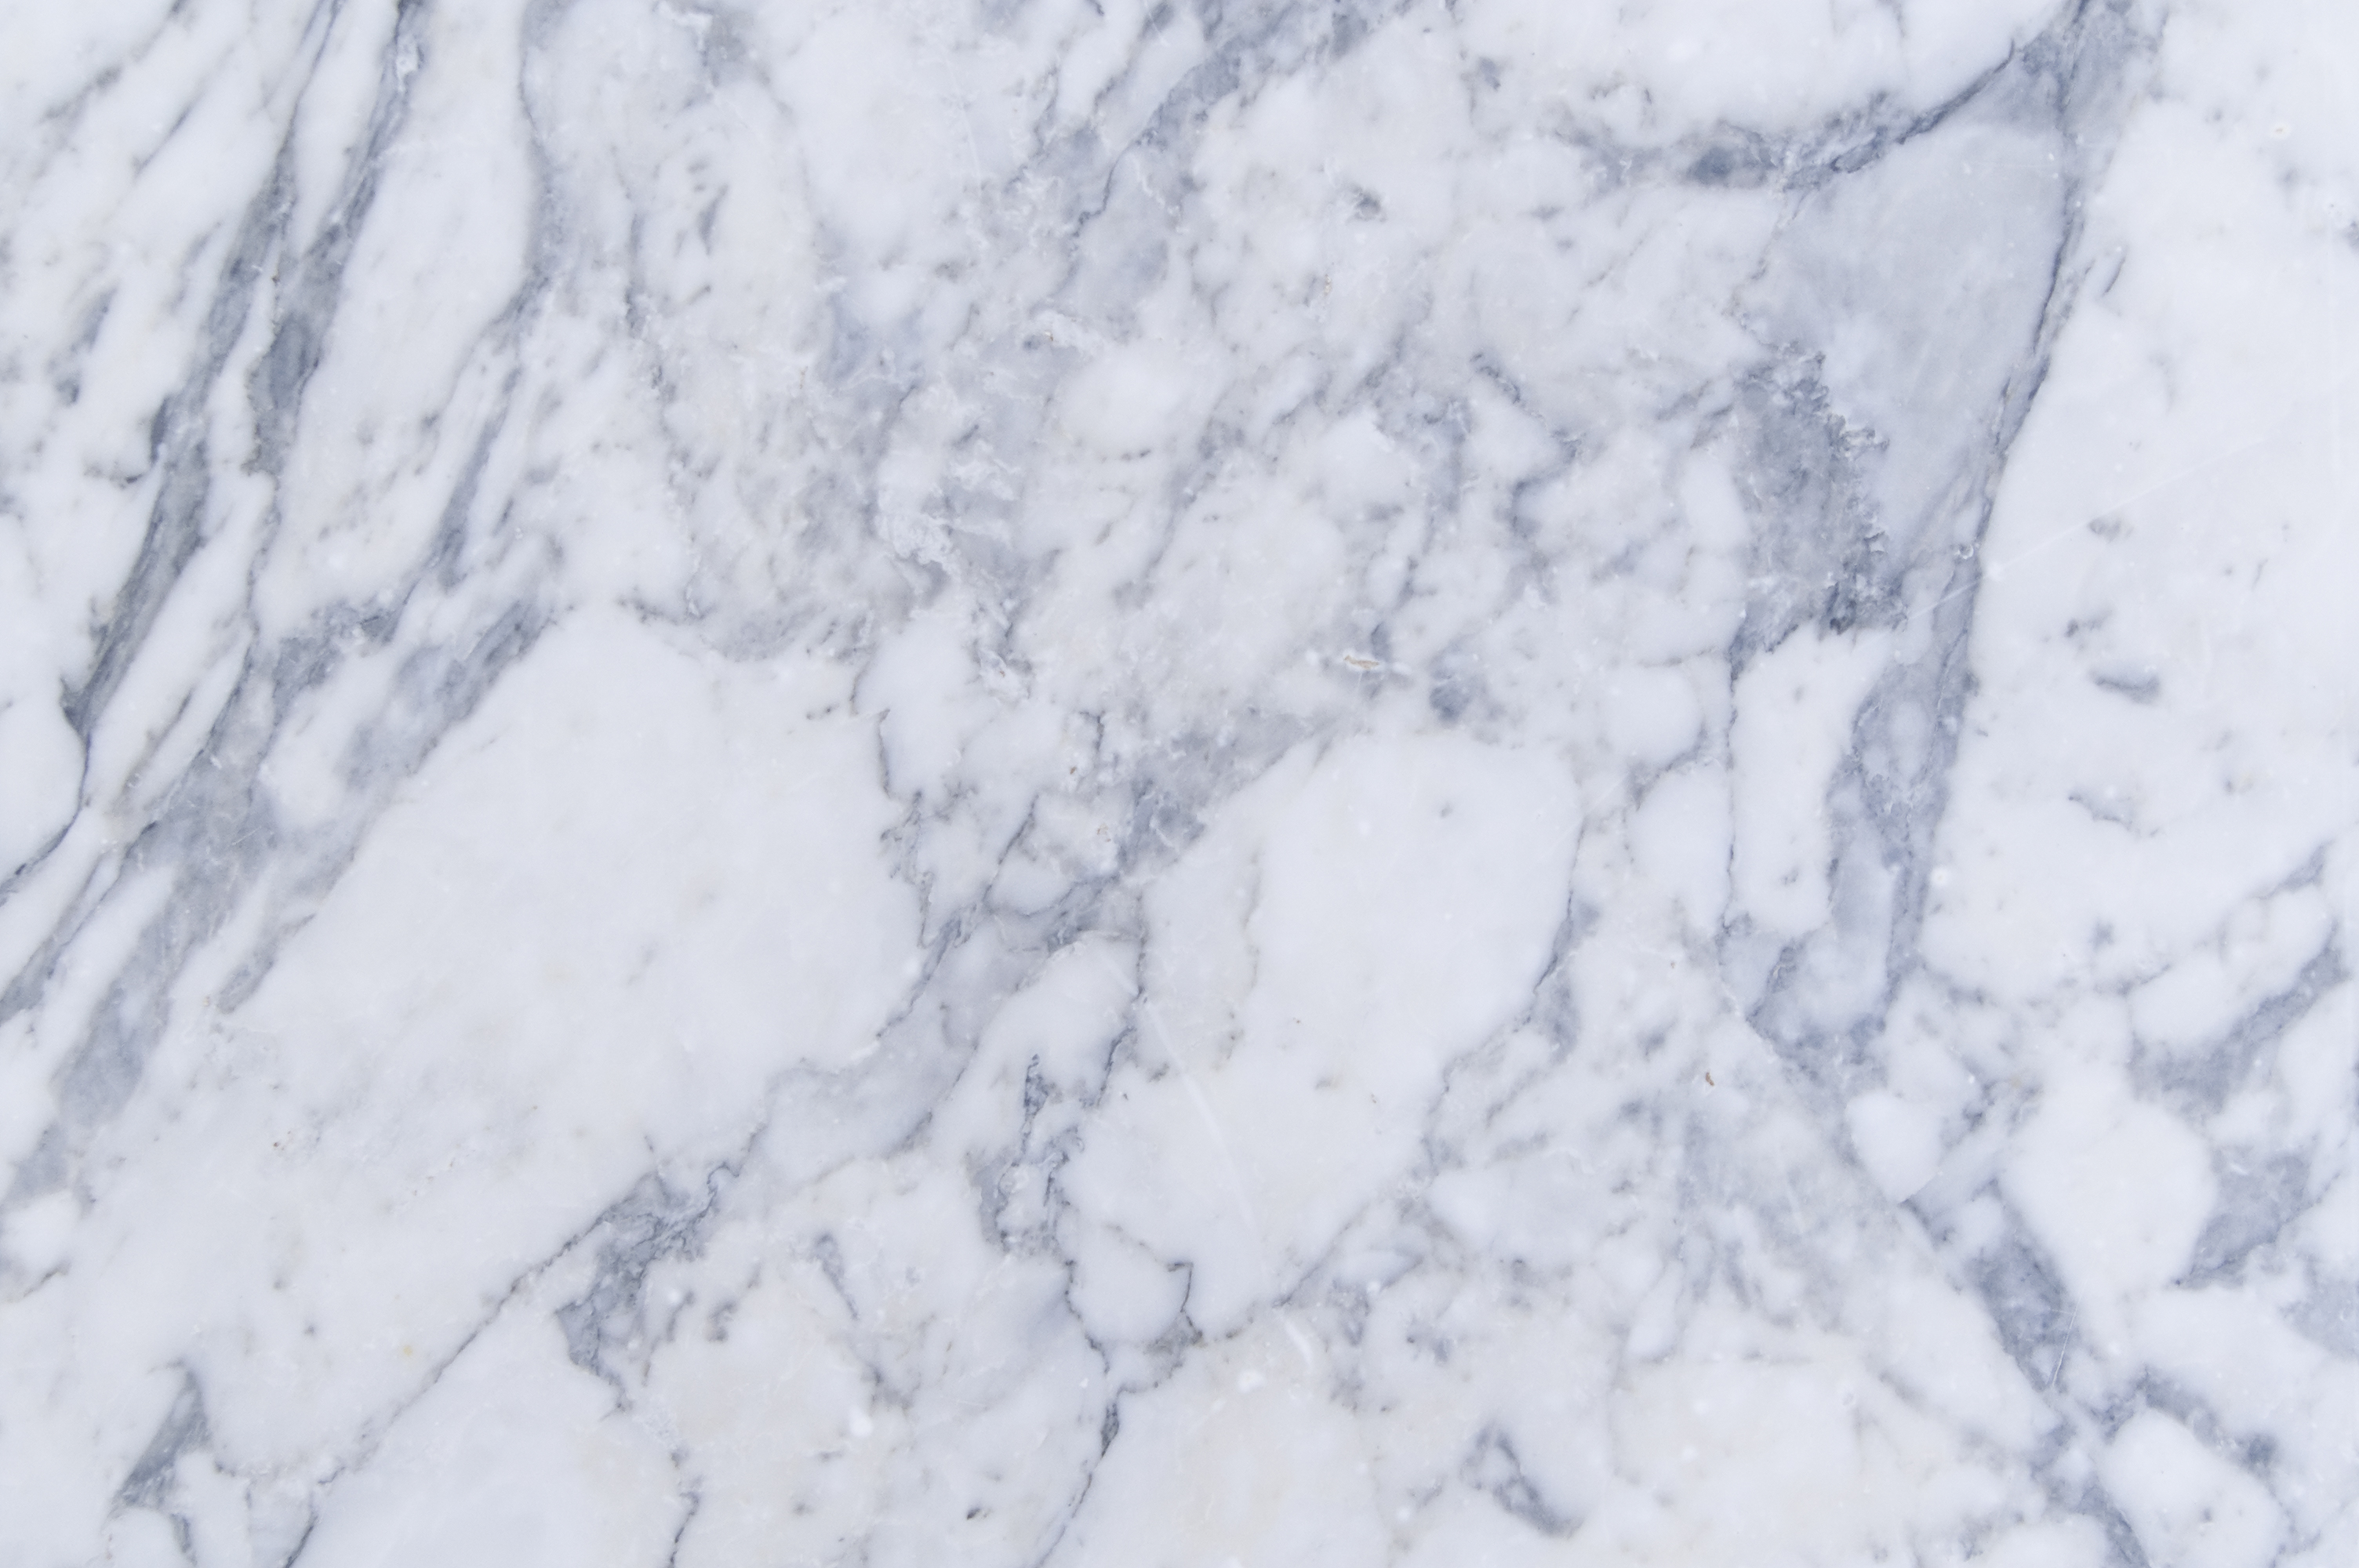 Black Marble Iphone Wallpaper 3008x2000